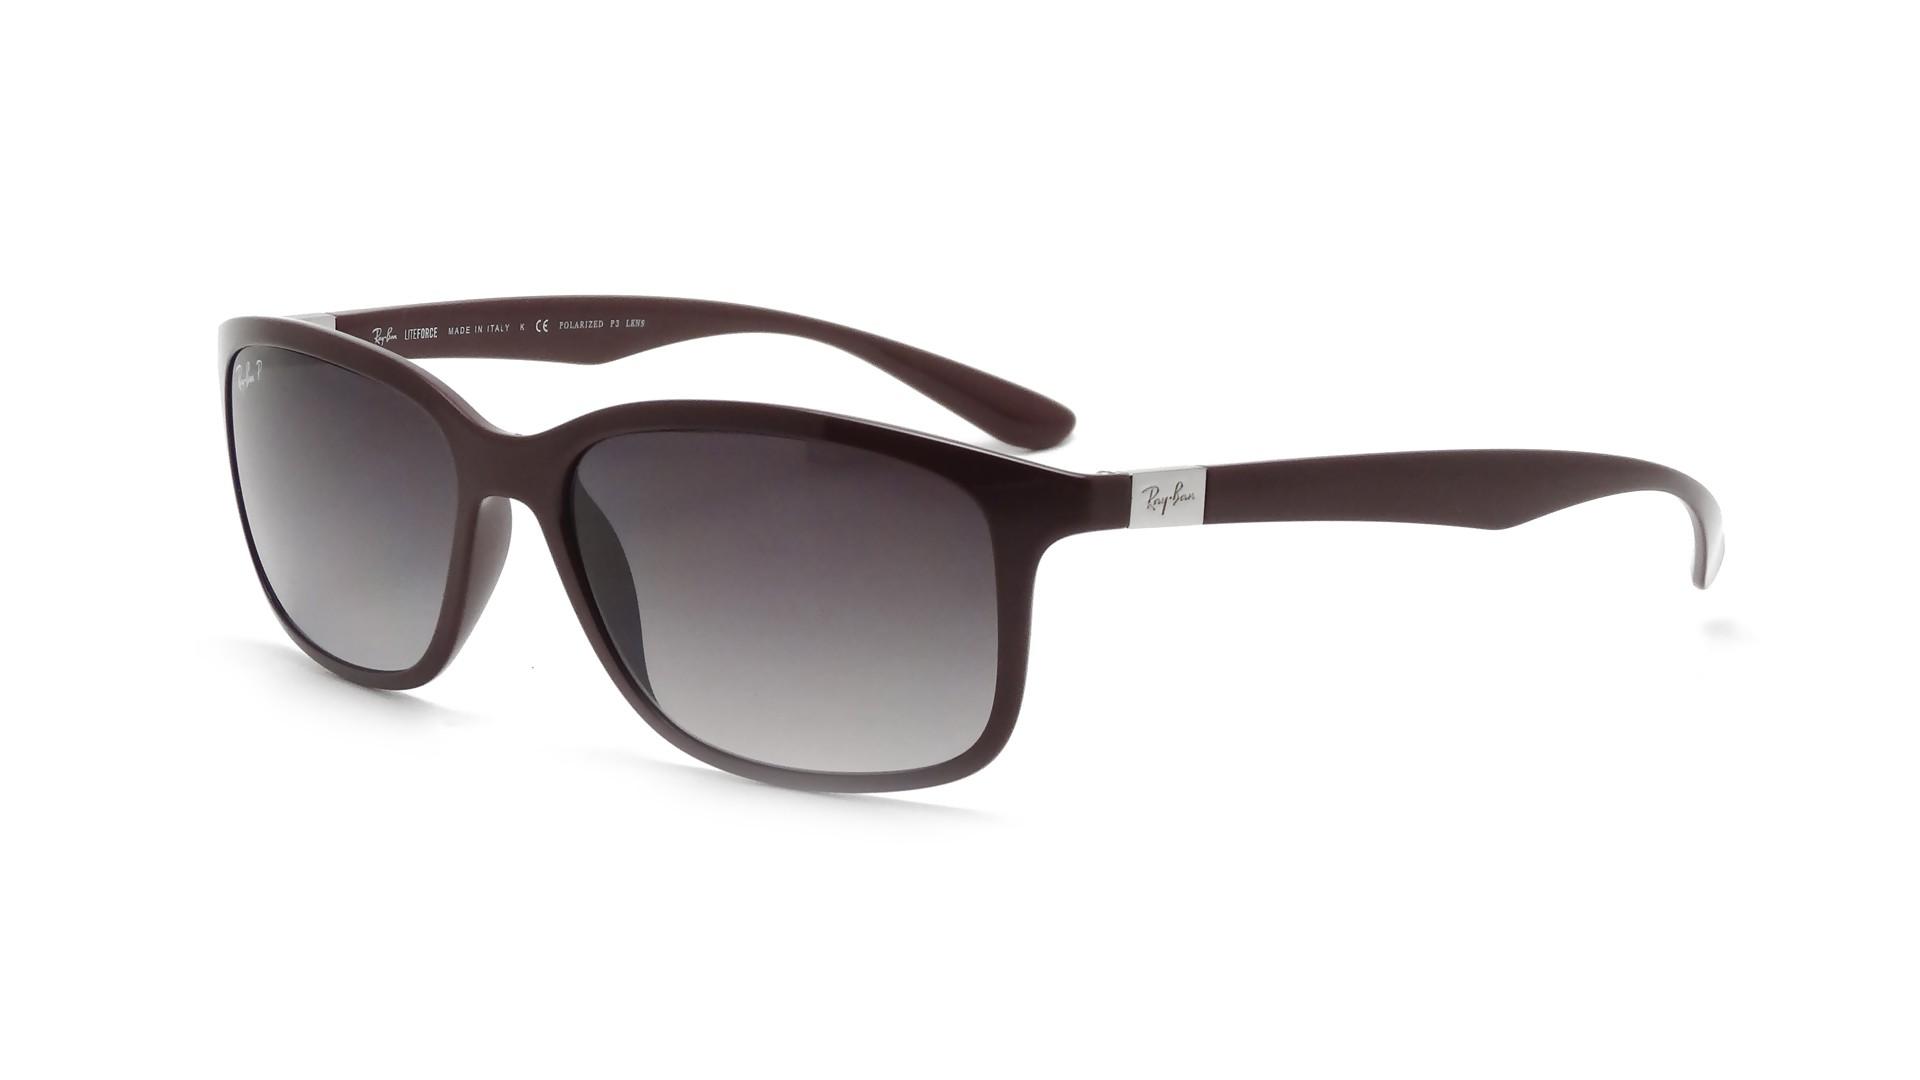 80d23e998cd Sunglasses Ray-Ban Tech Liteforce Purple RB4215 6128 T3 57-16 Large  Polarized Gradient